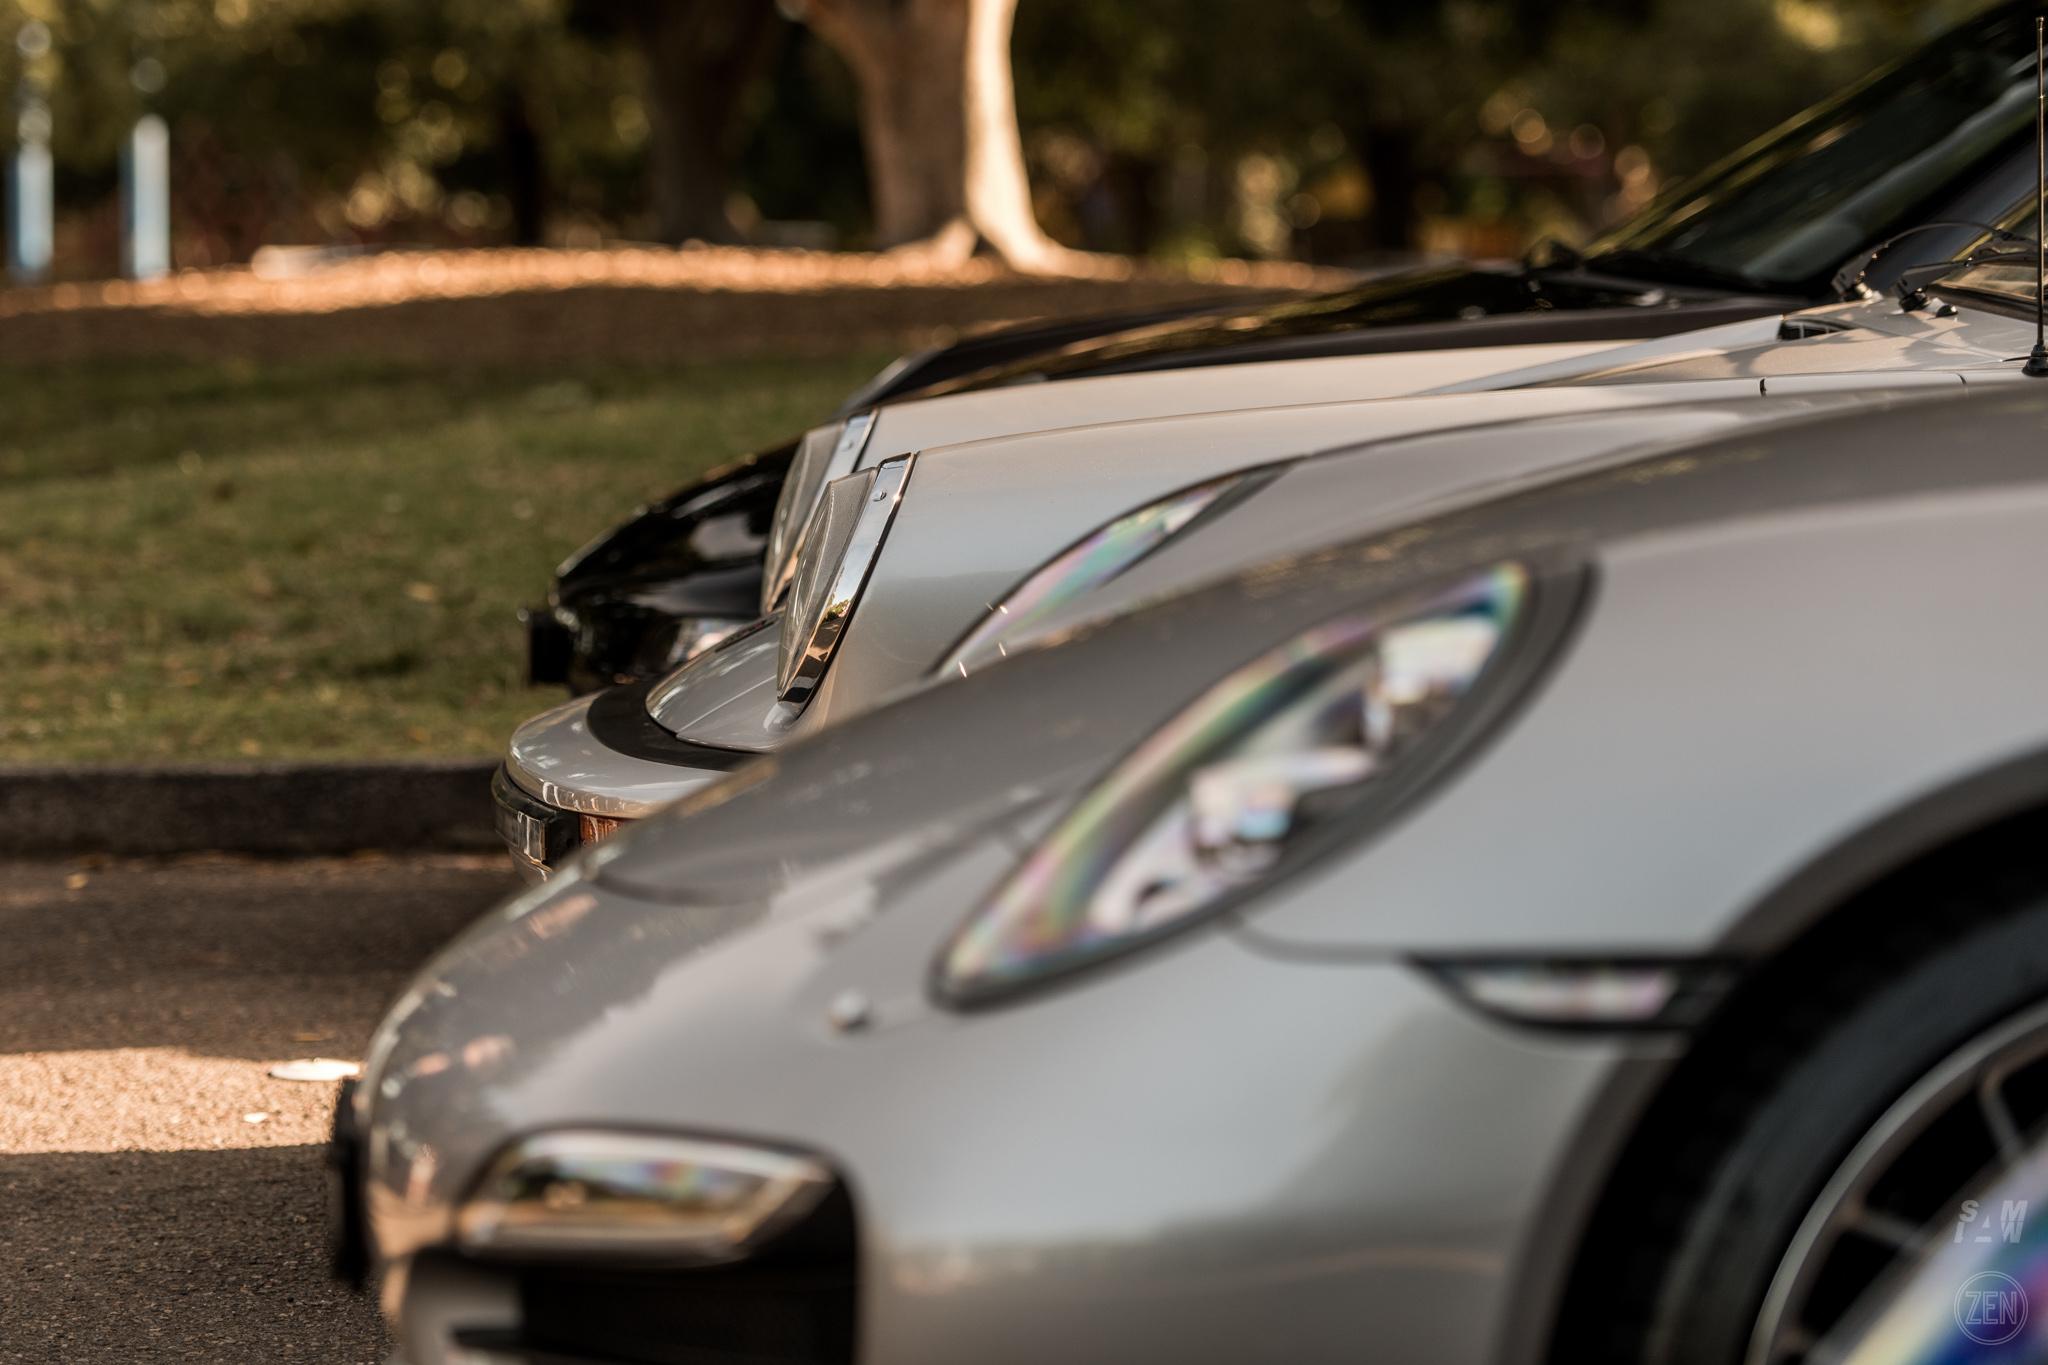 2019-10-27 - Autohaus Porsches & Coffee 110